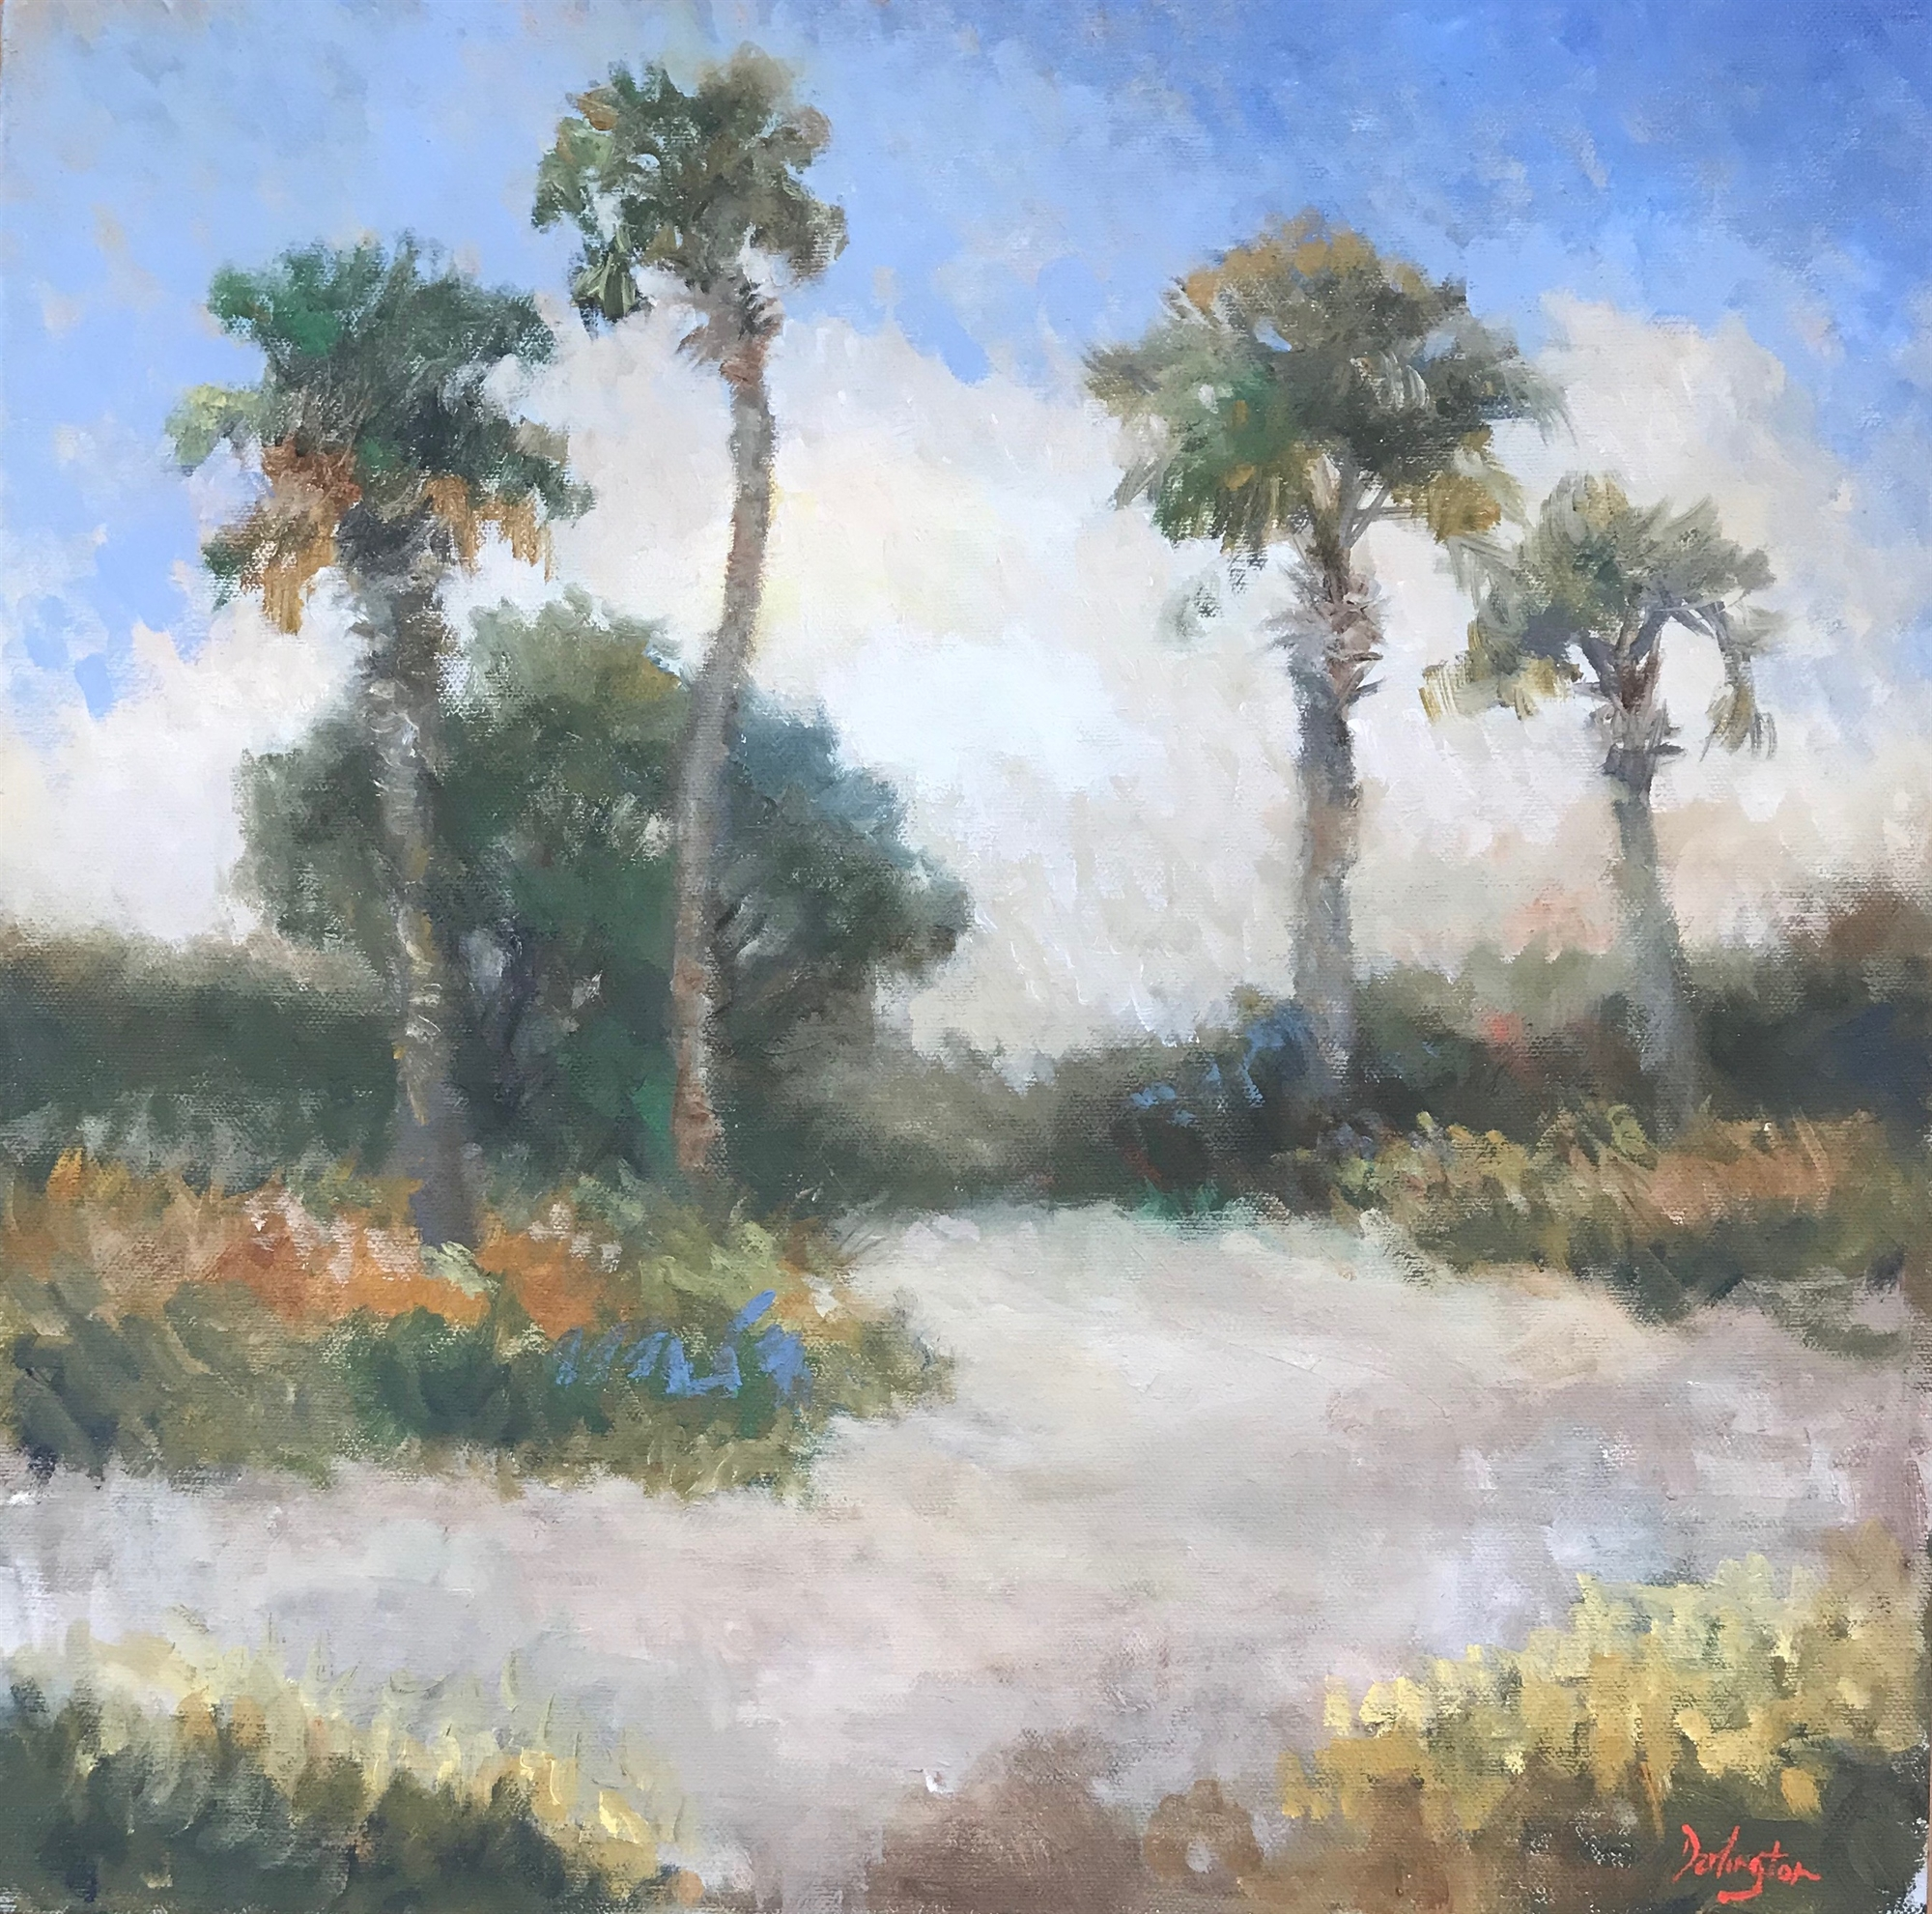 Palmettos on the Beach by Jim Darlington